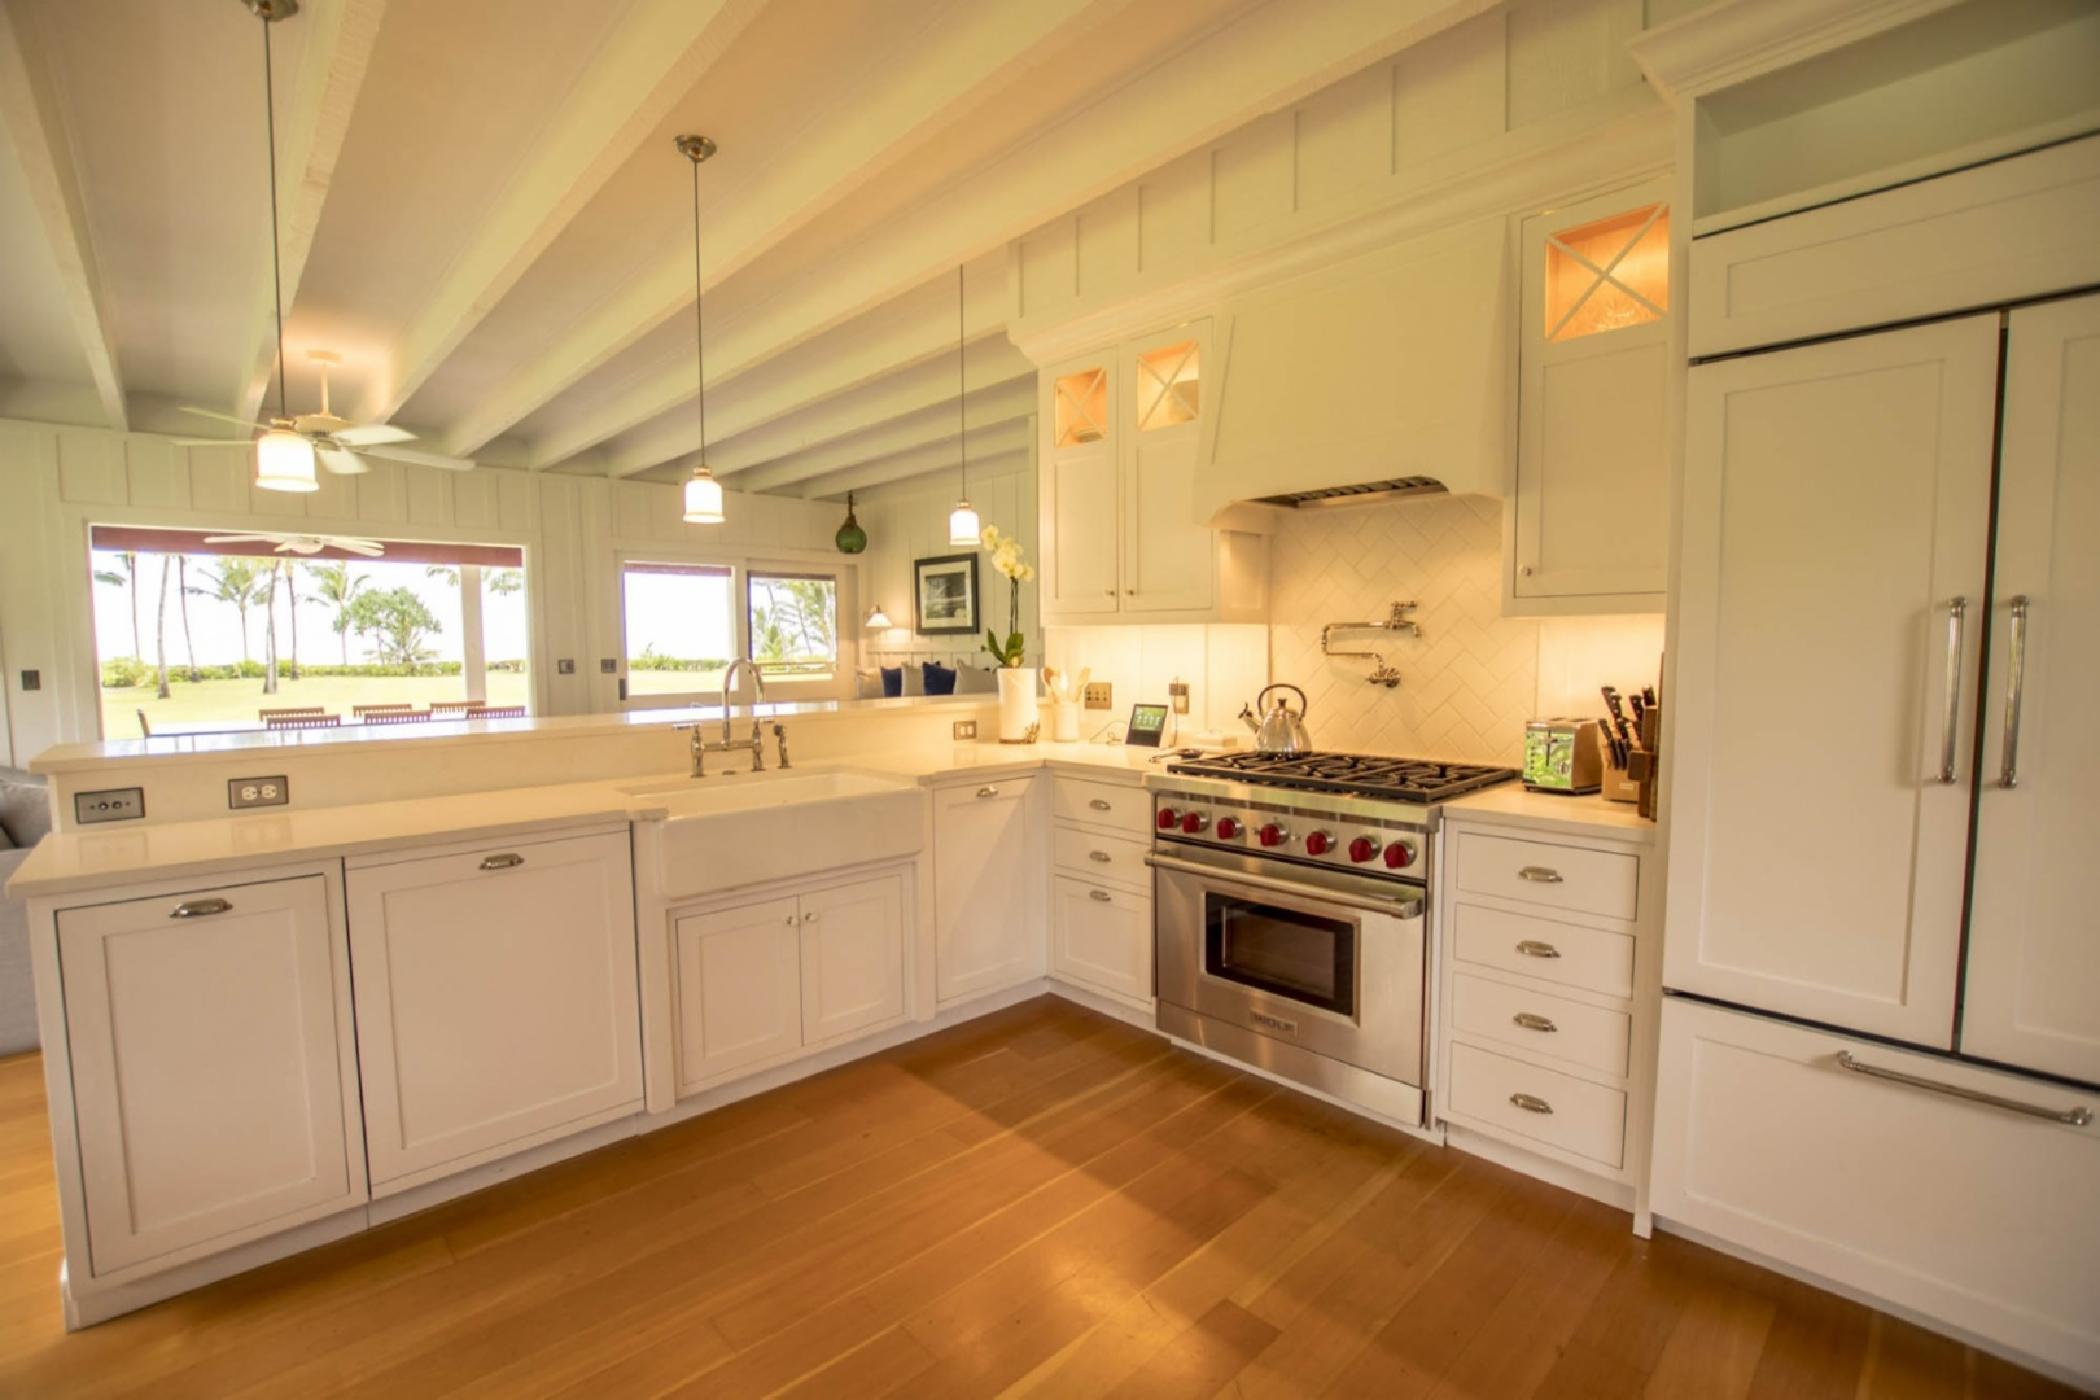 kitchen_001.jpeg